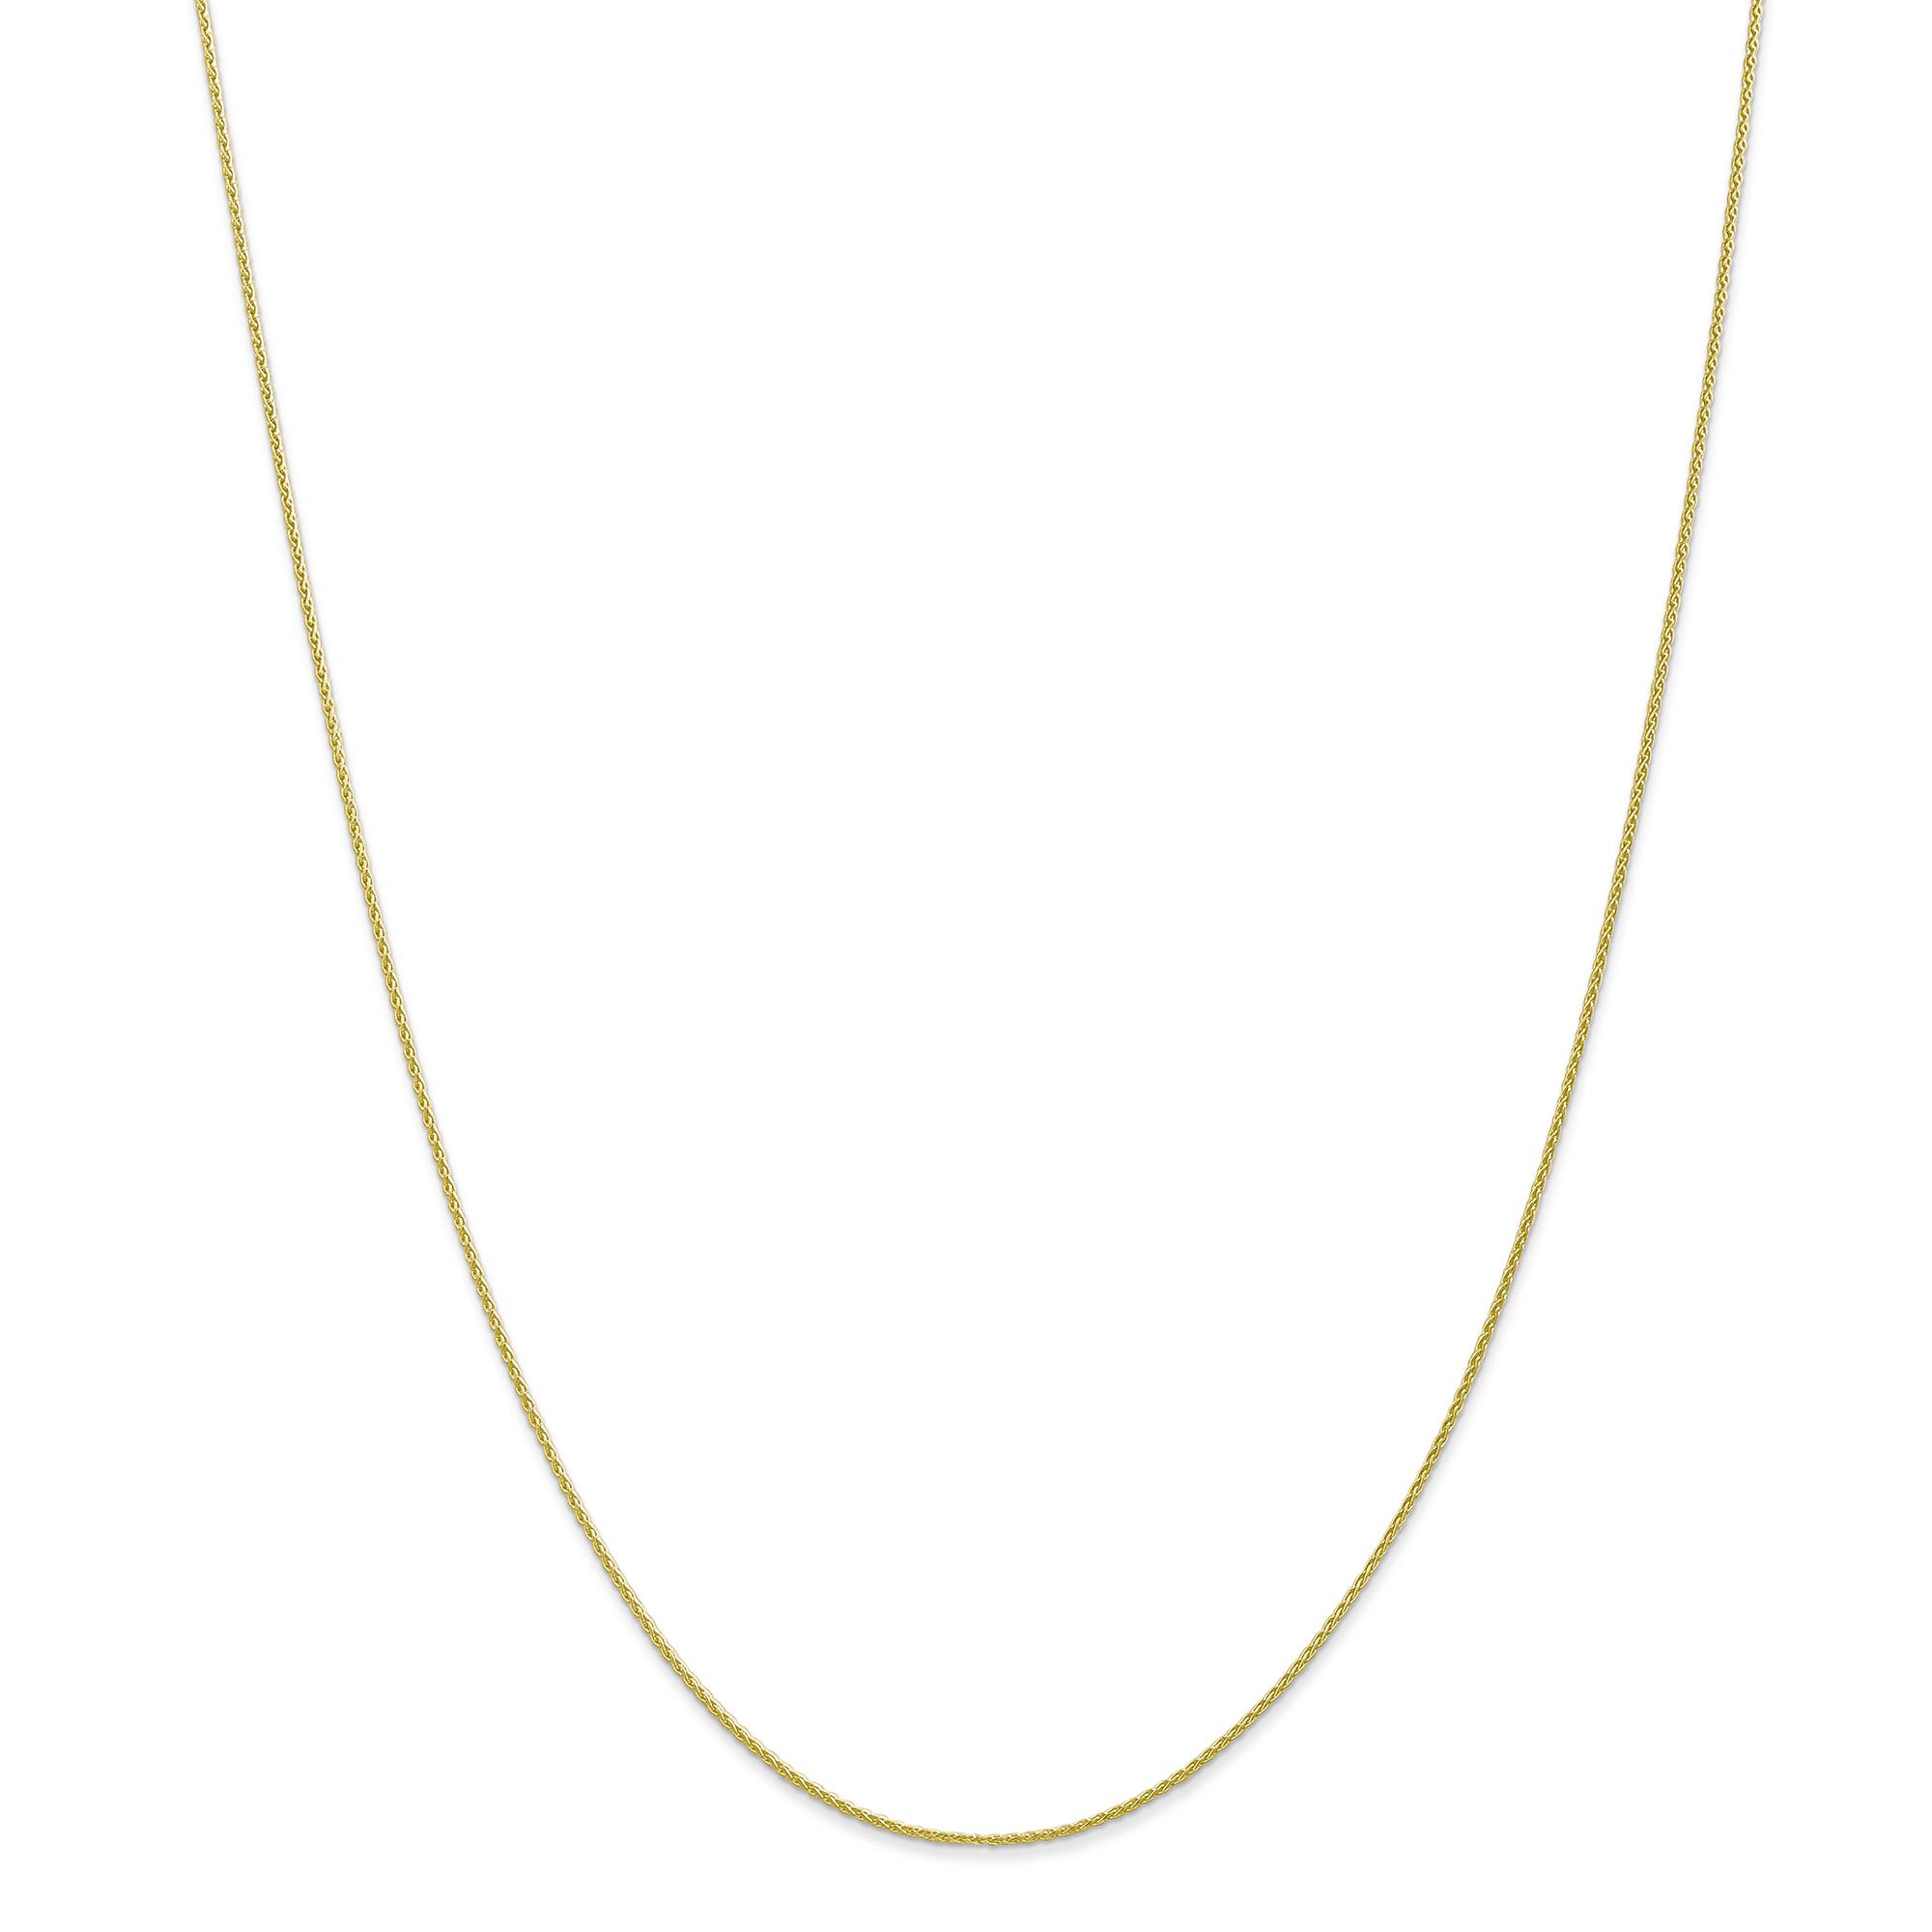 10K Yellow Gold .95mm Parisian Wheat Chain 20 Inch - image 5 of 5